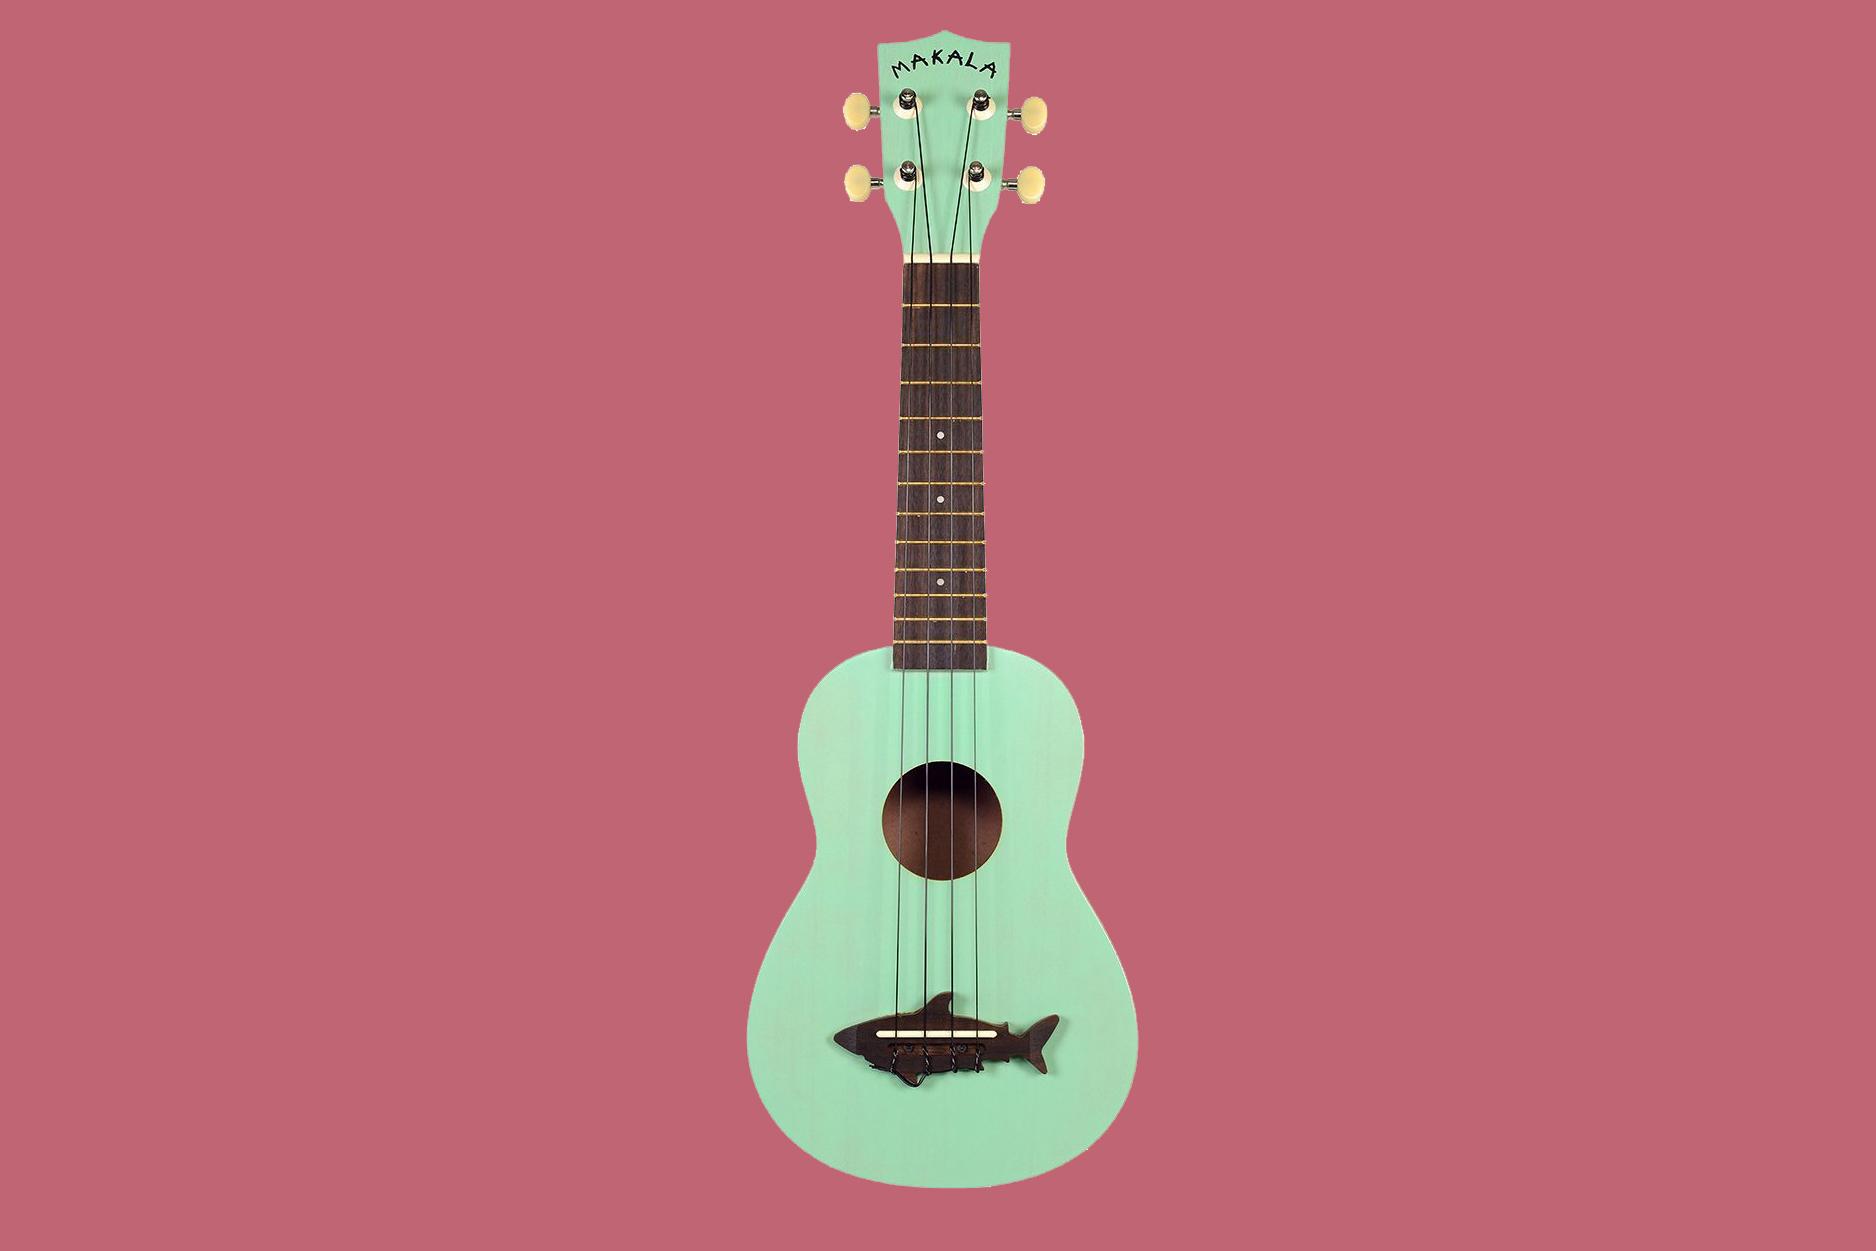 mint green shark ukulele